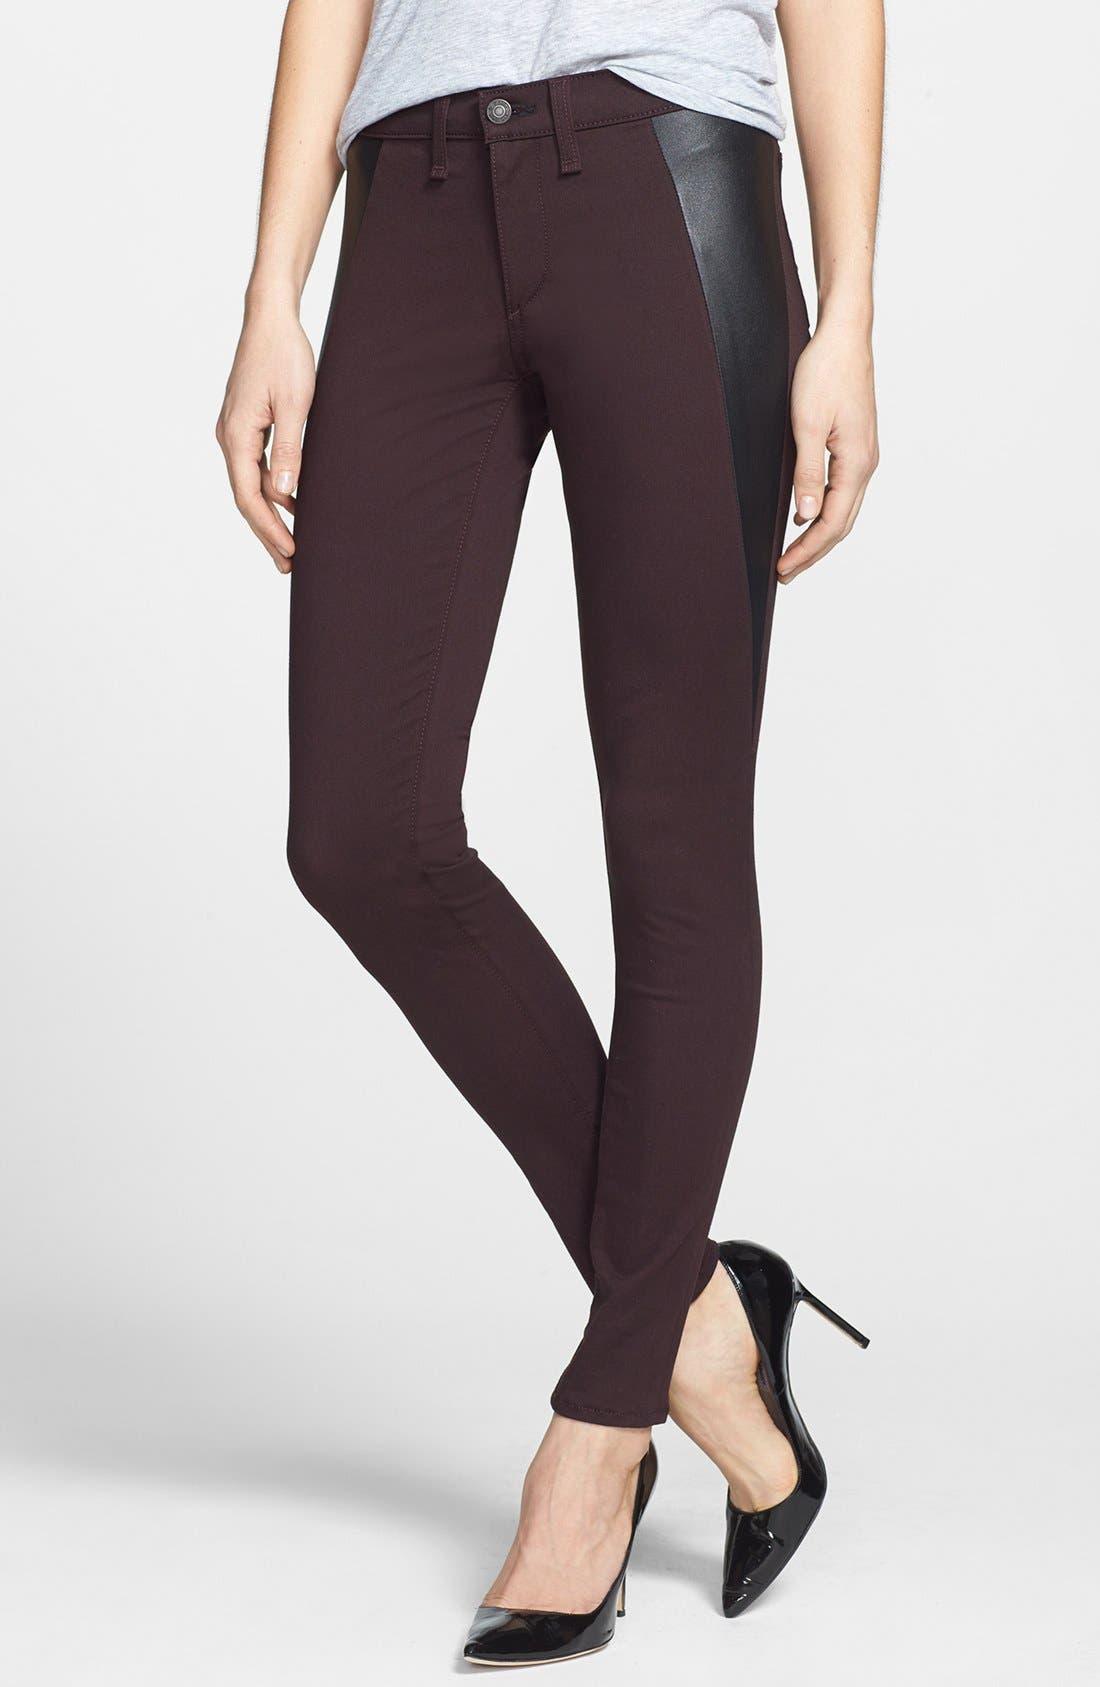 Main Image - rag & bone/JEAN 'Pop' Leather Inset Skinny Jeans (Wine)